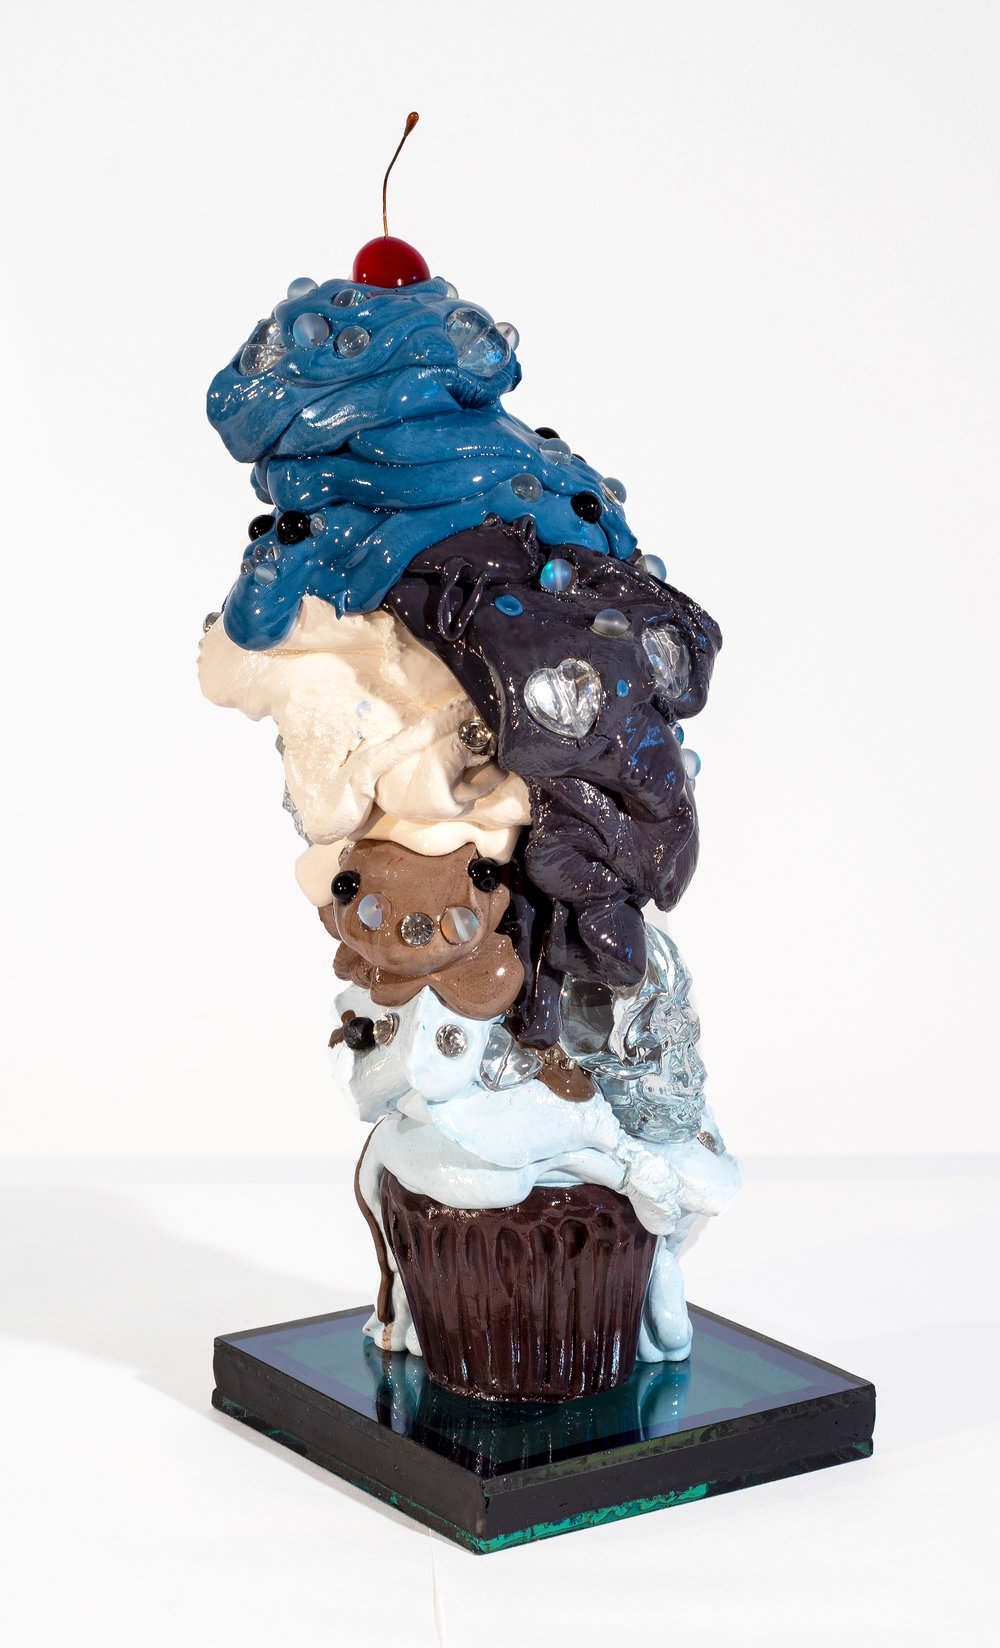 "'Til Death Do Us Part - Olivia Bonilla16"" x 6"" x 6""Cement, glass, resin, mixed media$900"